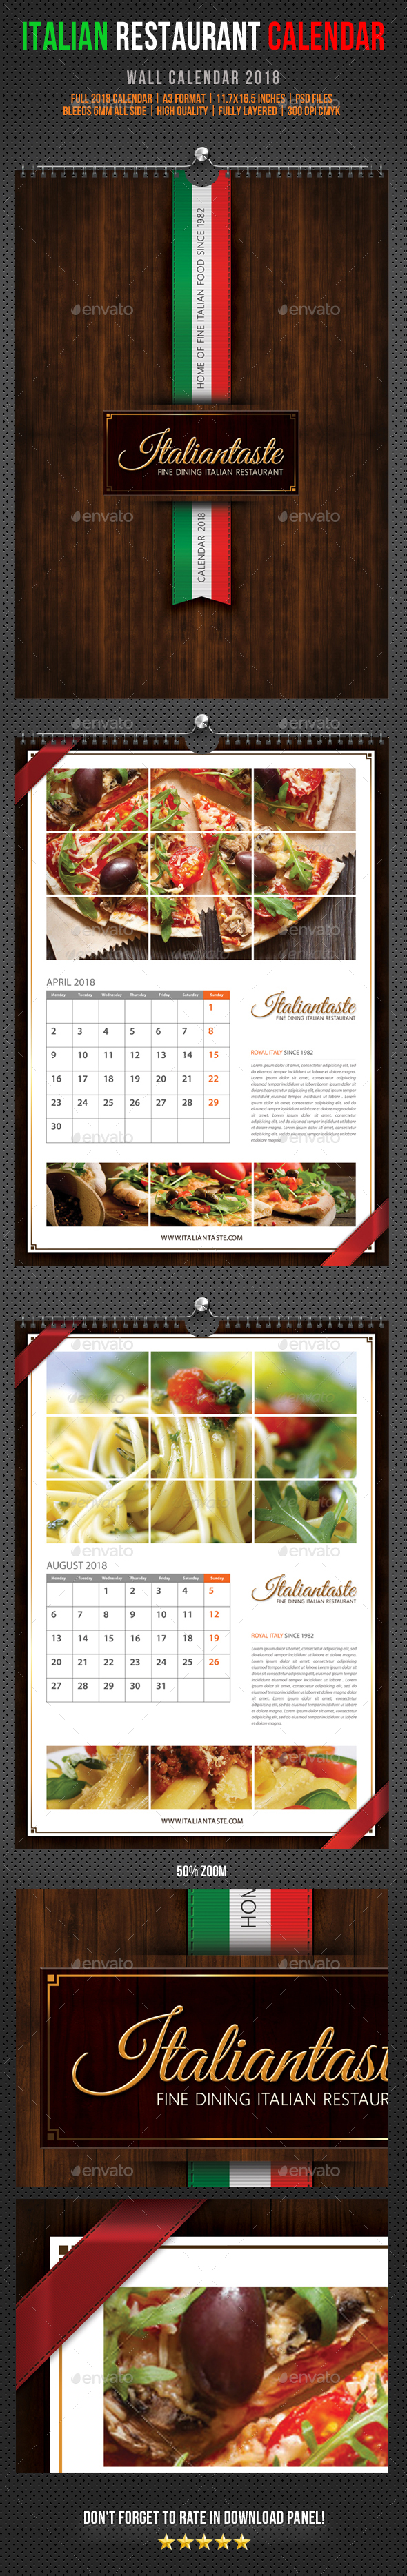 Italian Restaurant Wall Calendar 2018